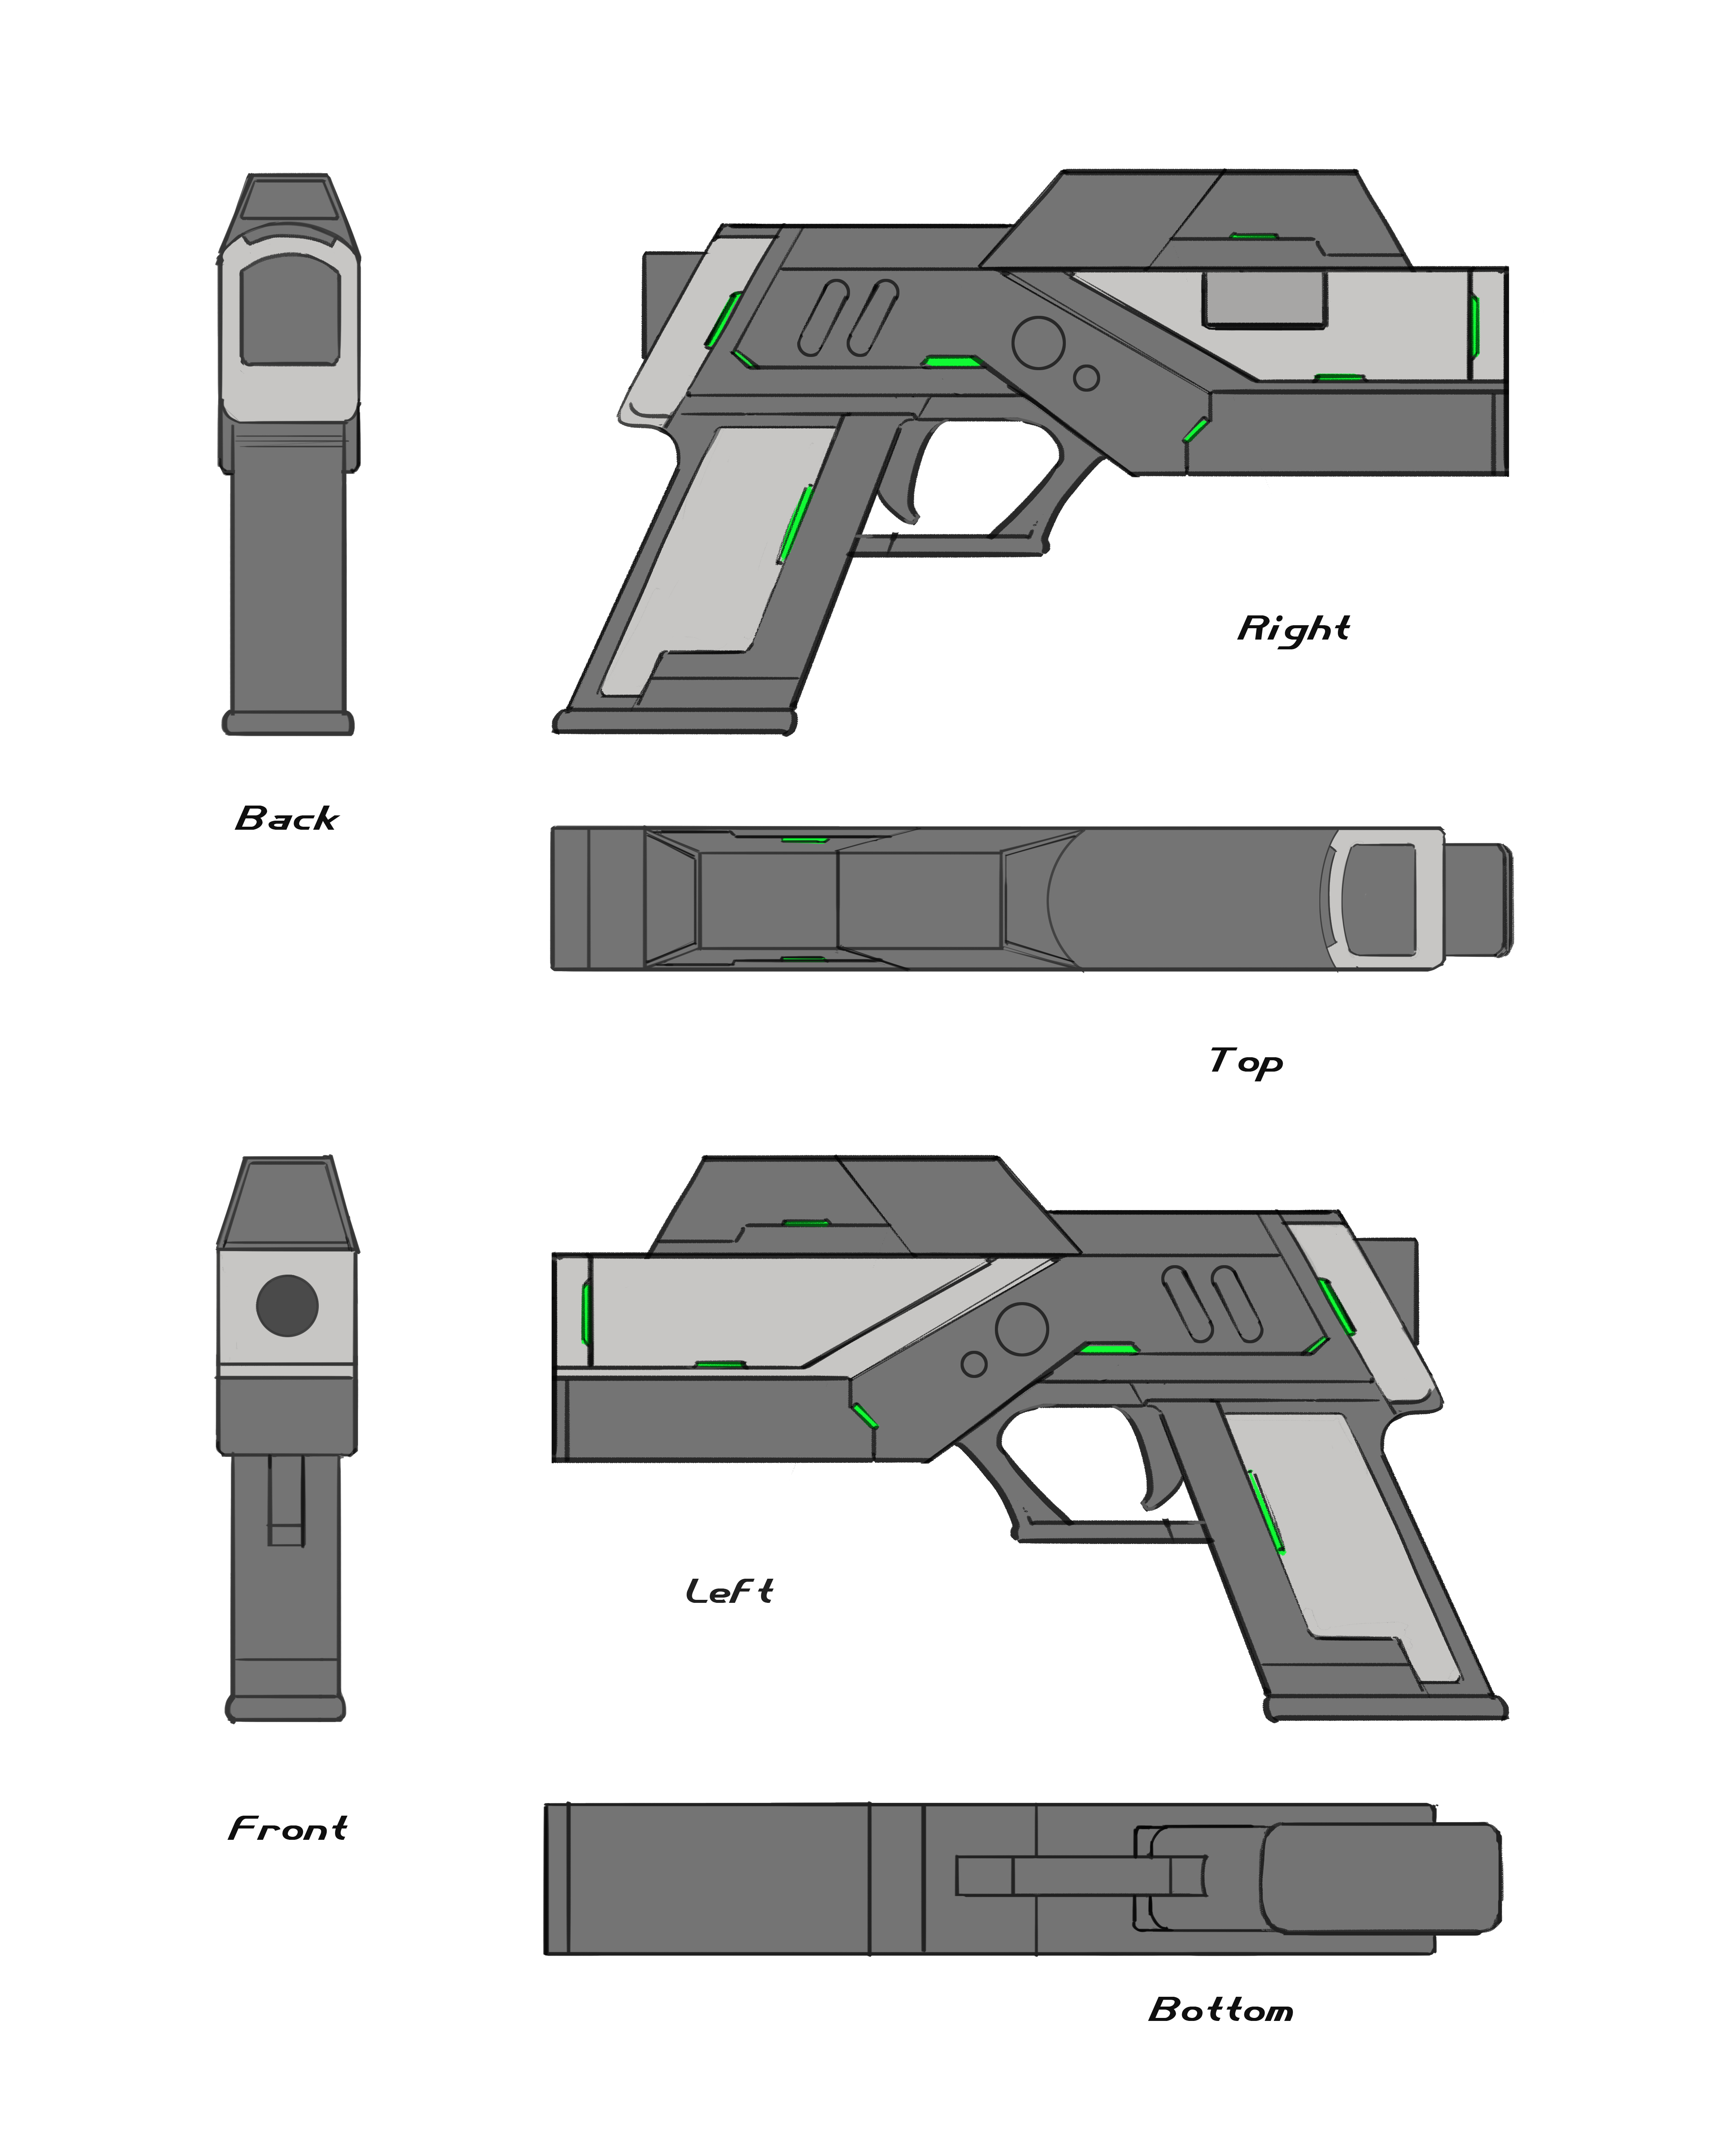 3d Gun Image 3d Home Architect: Another Pistol Concept Final Sheet Image